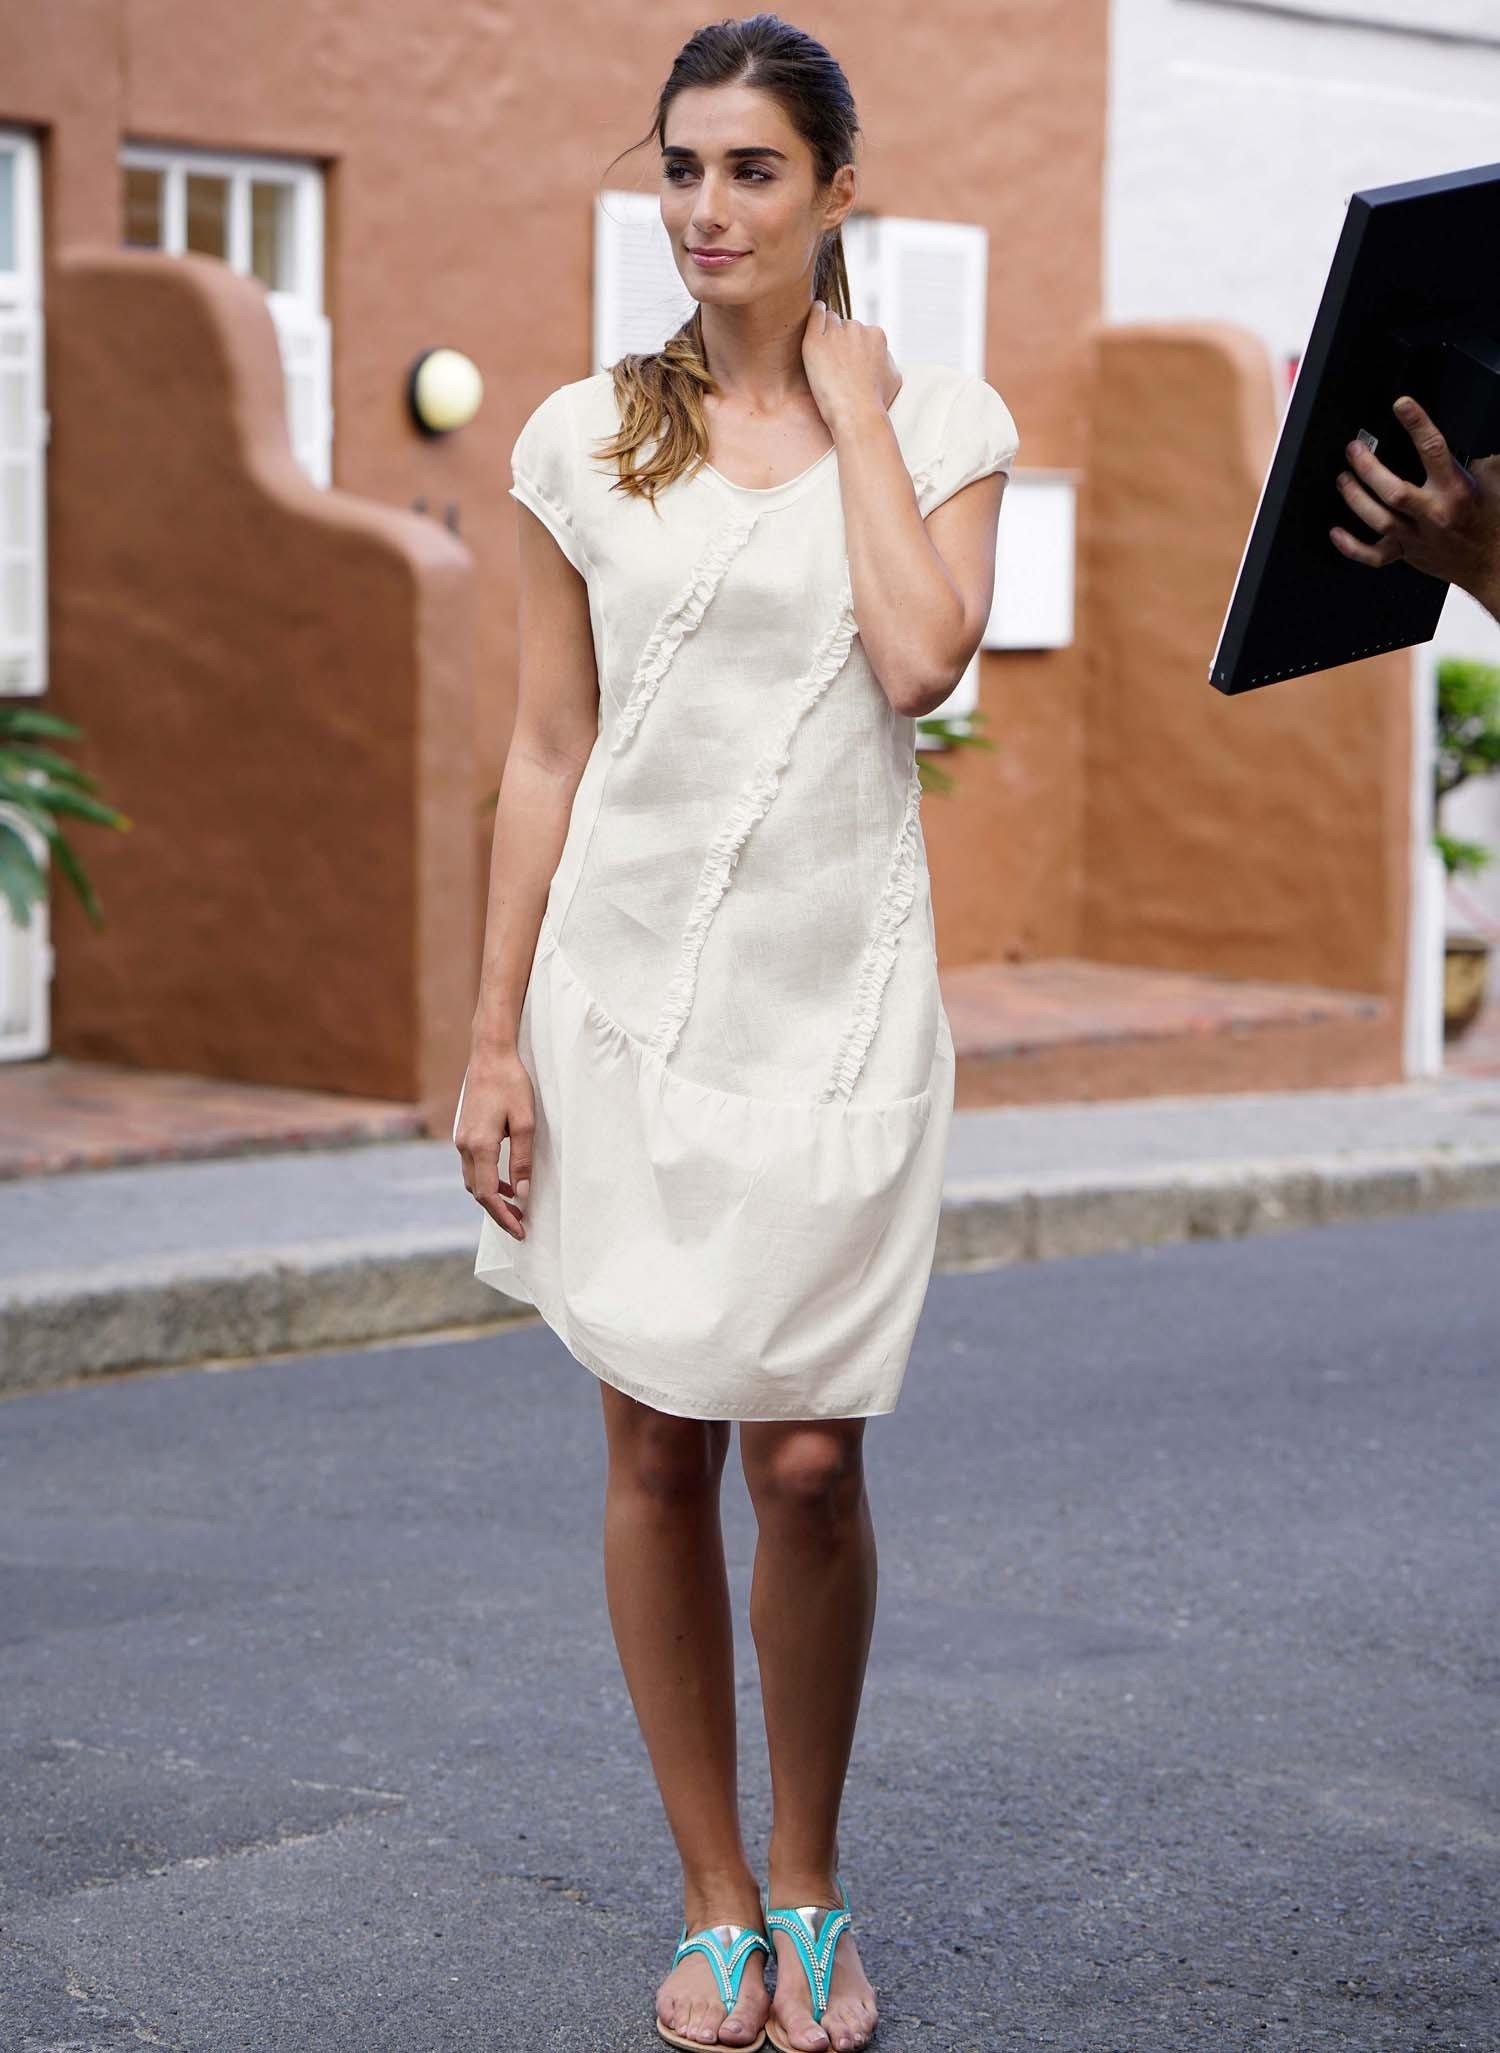 D-Leinen-Kleid,Rüschen weiss L 001 - 2 - Ronja.ch